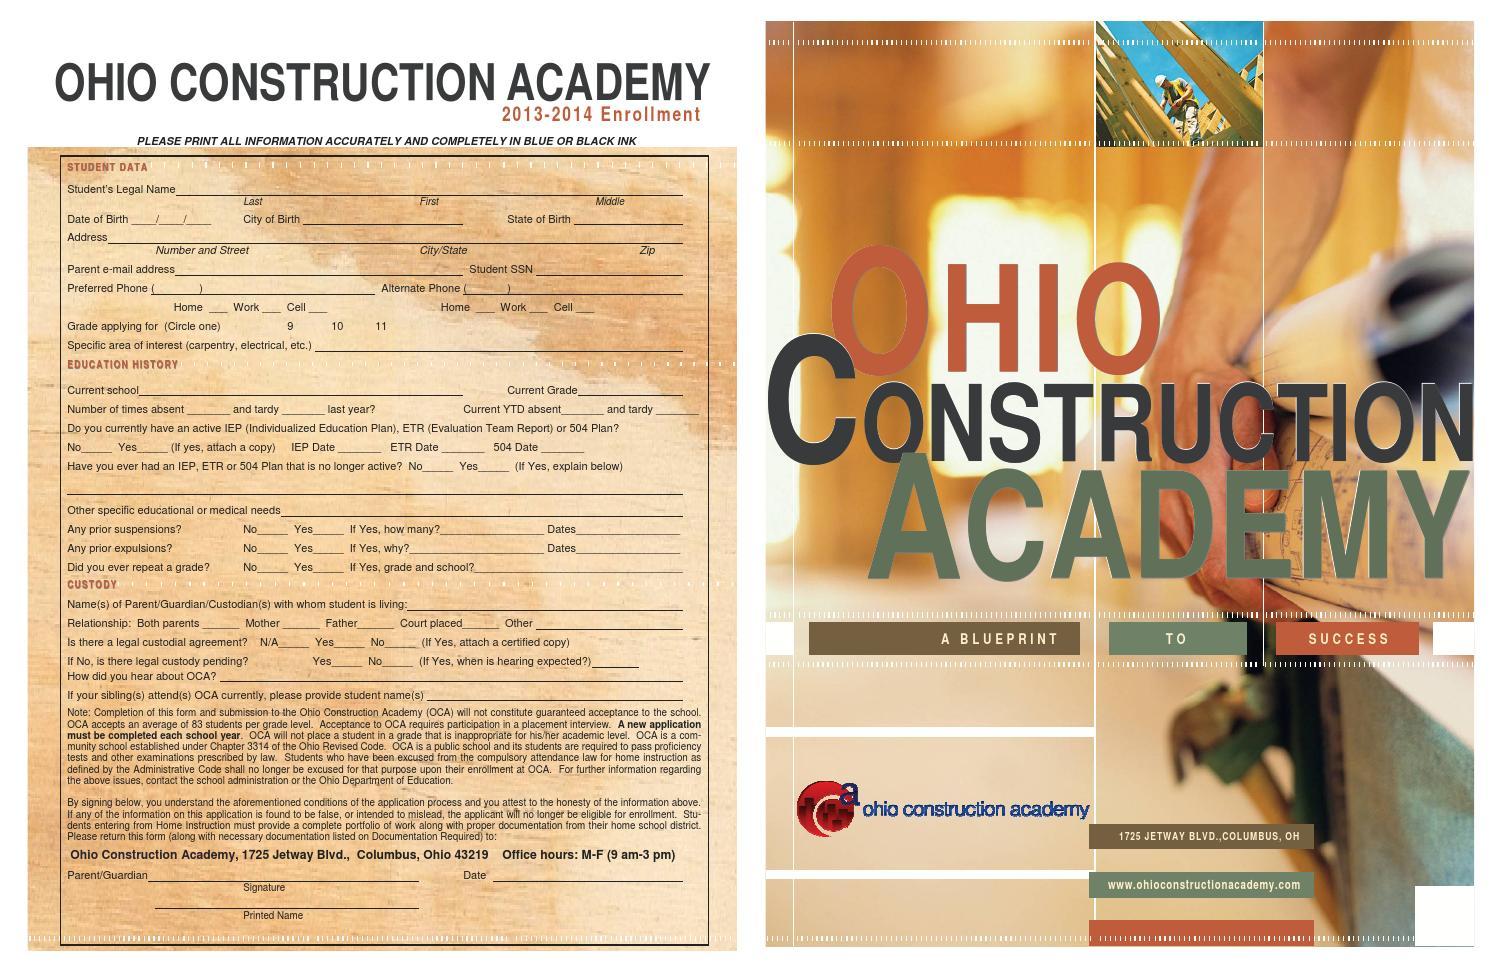 Oca brochure application by ohio construction academy issuu malvernweather Images